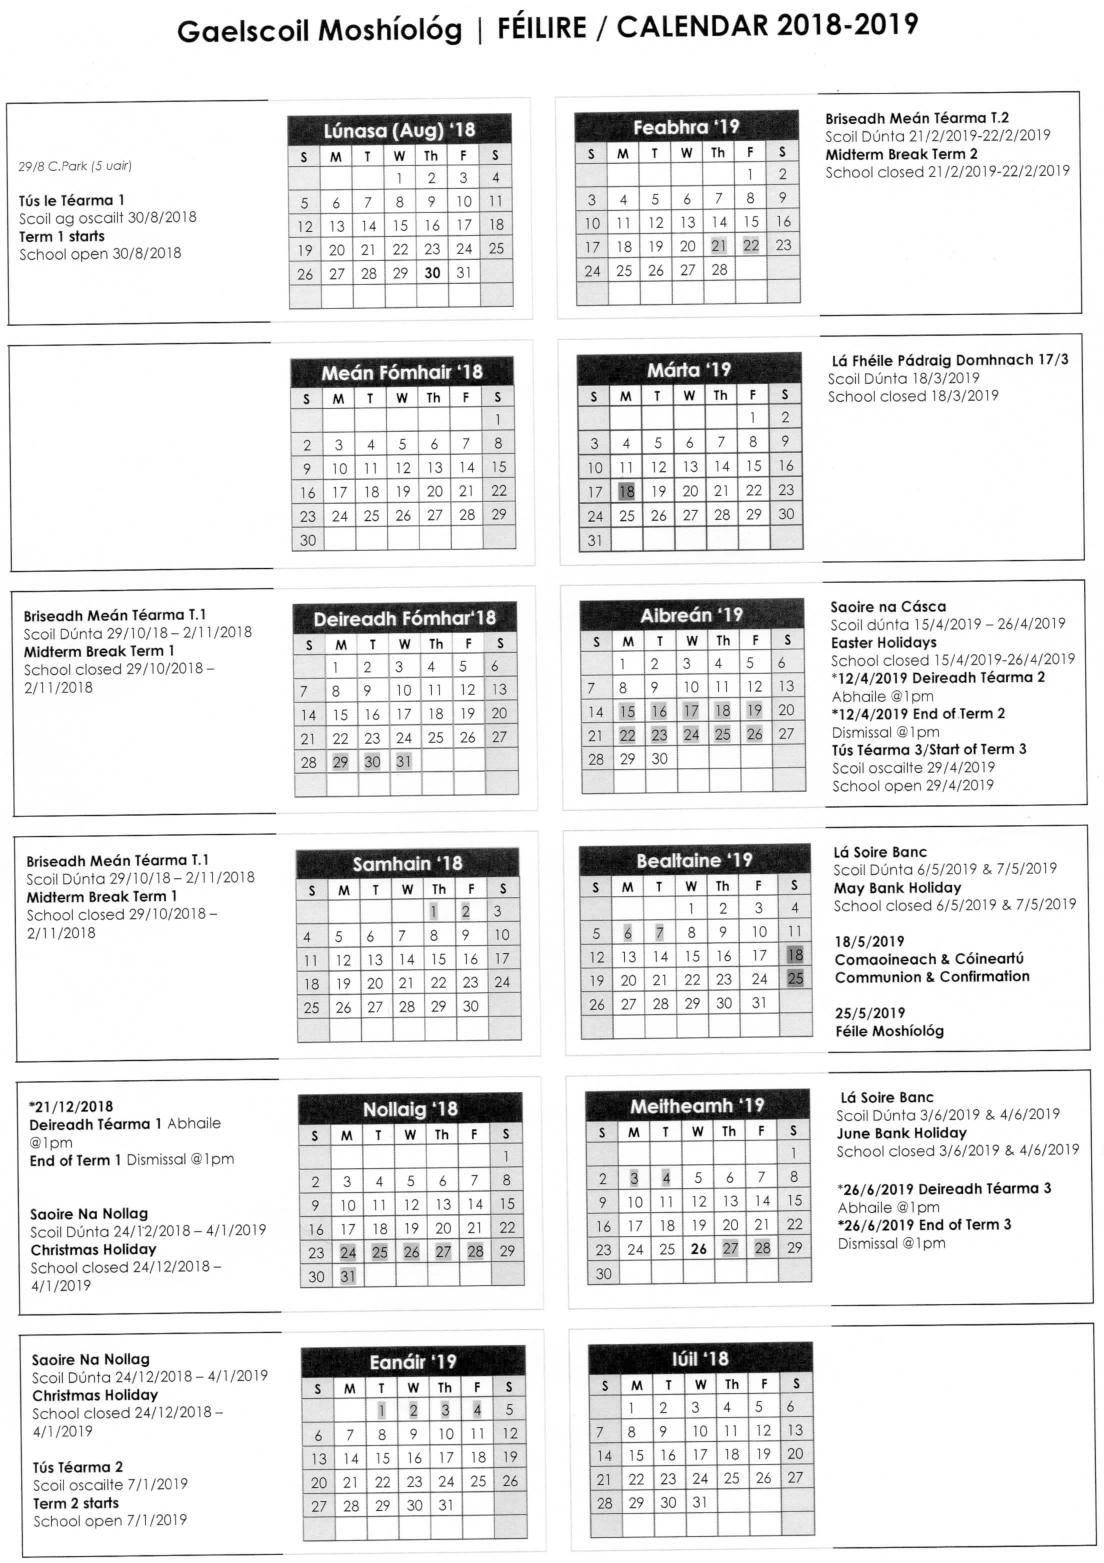 Gaelscoil Calendar 2018-2019